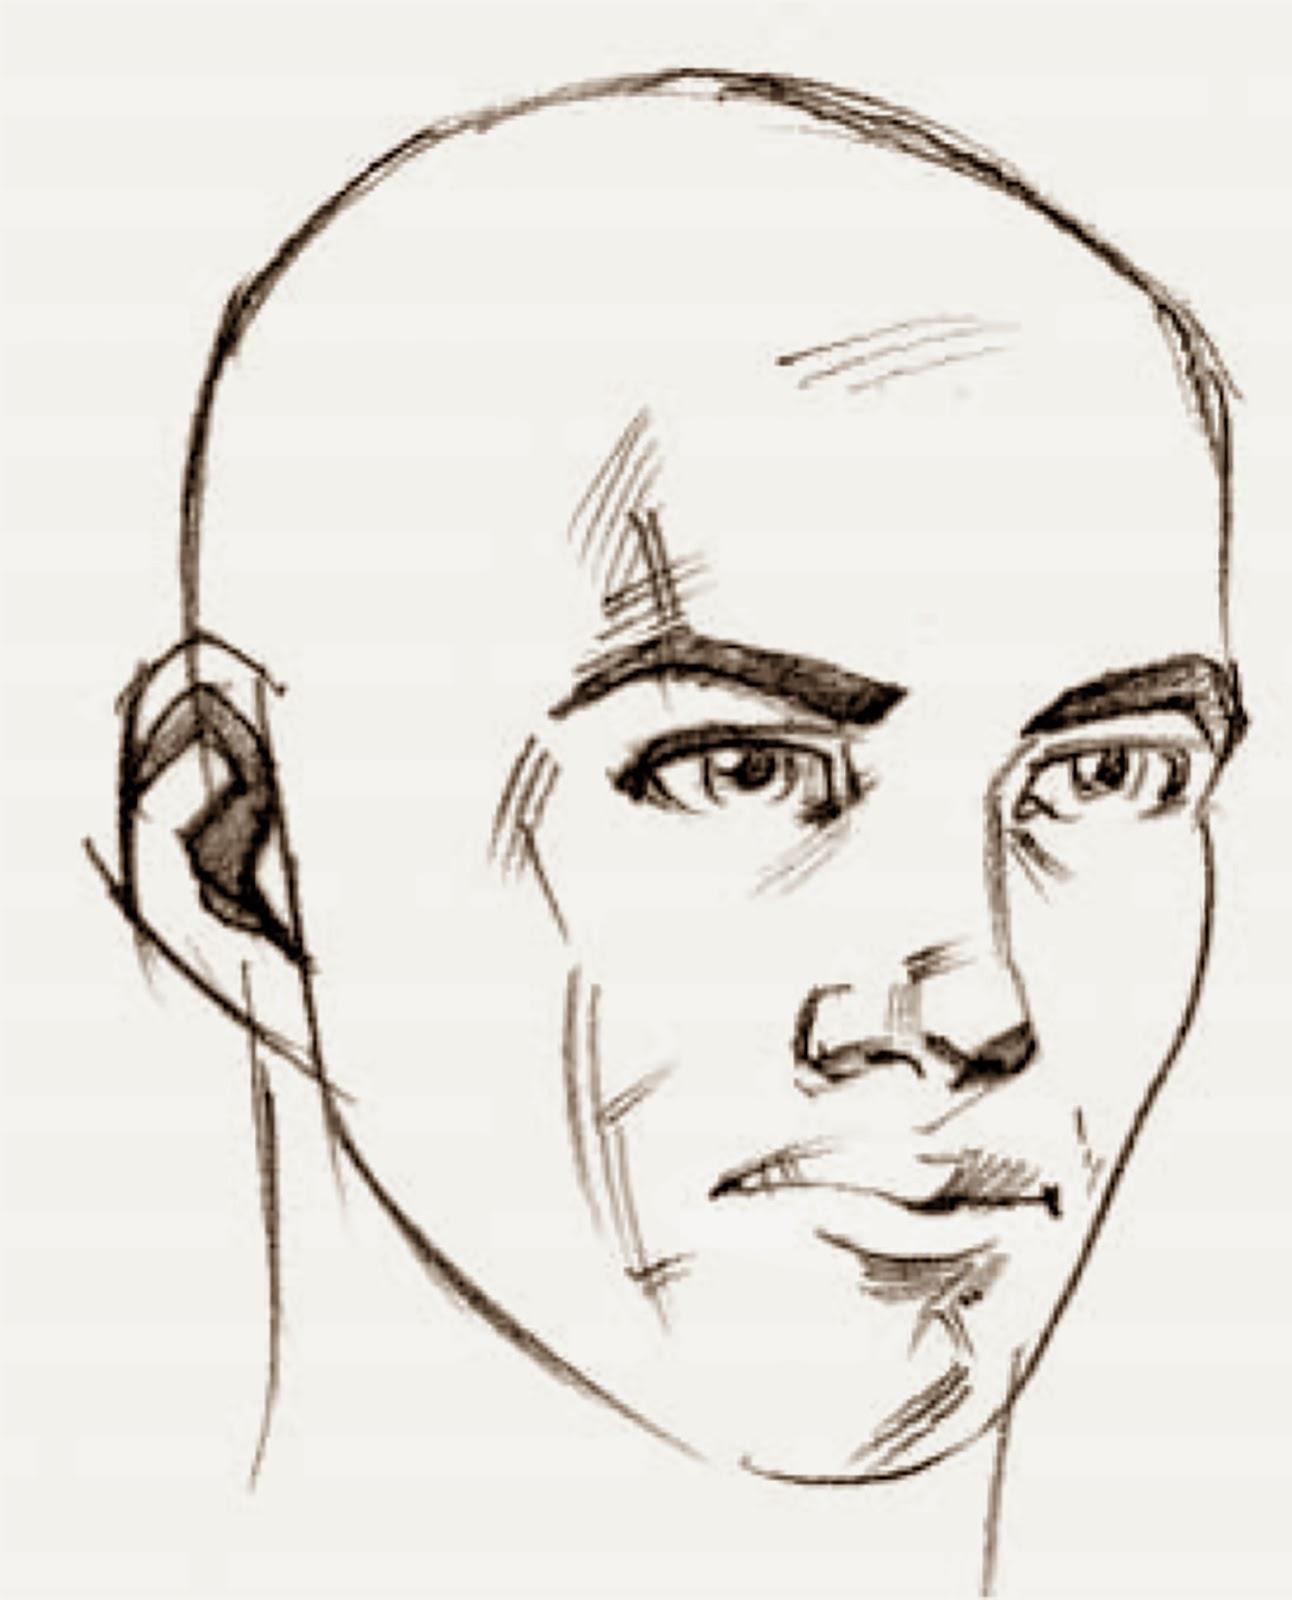 Human ear drawing - photo#23